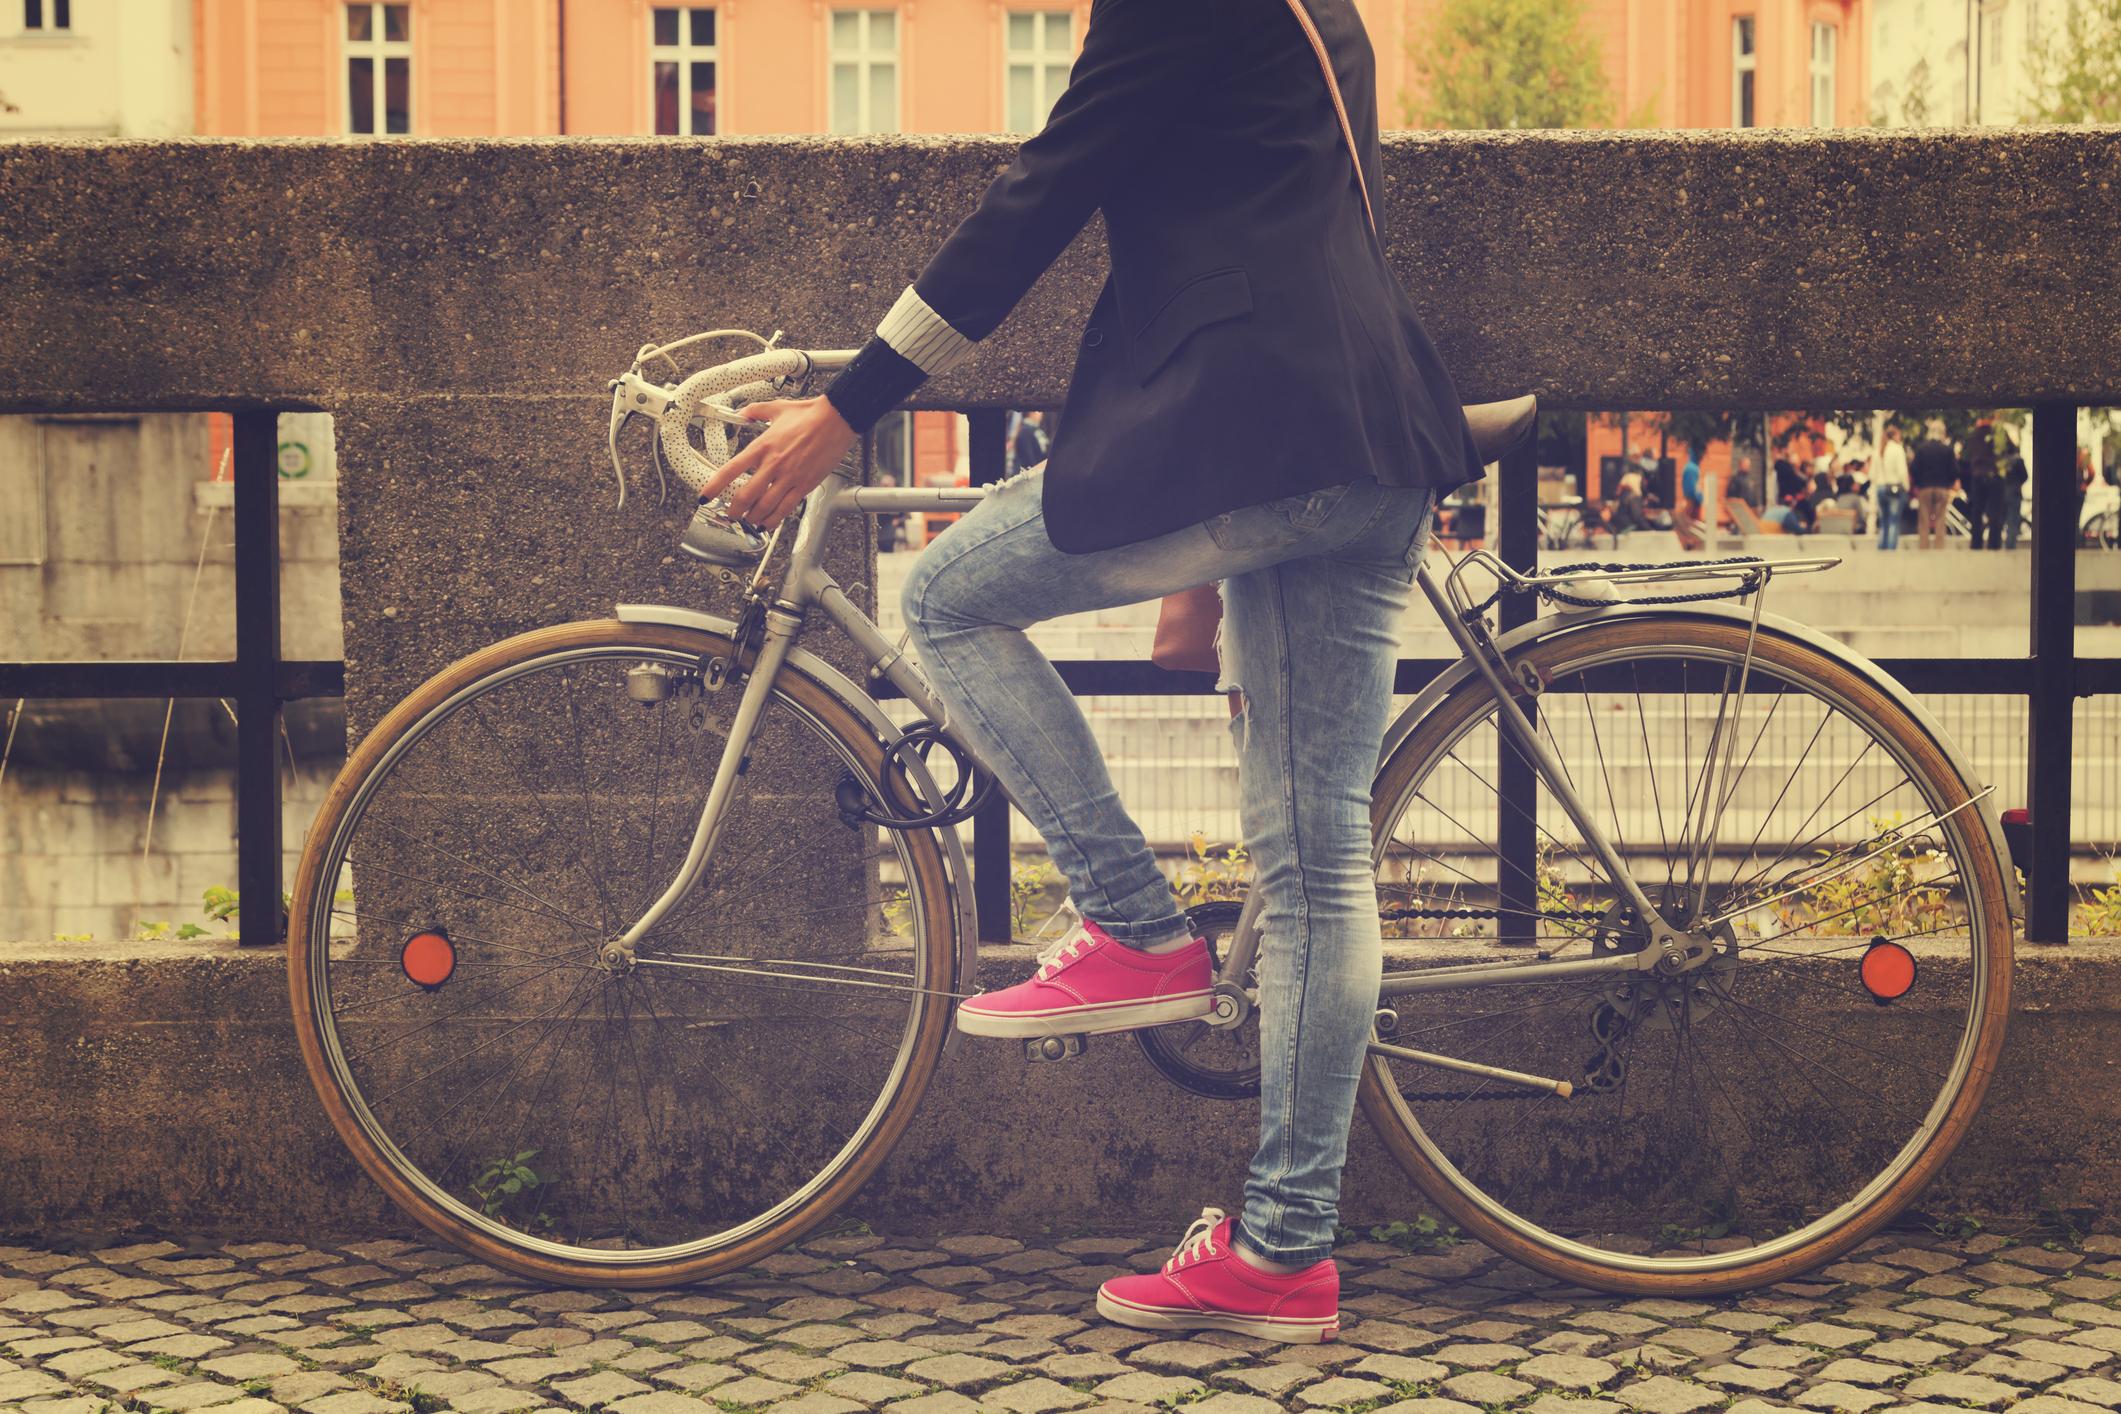 Mulher subindo na bicicleta